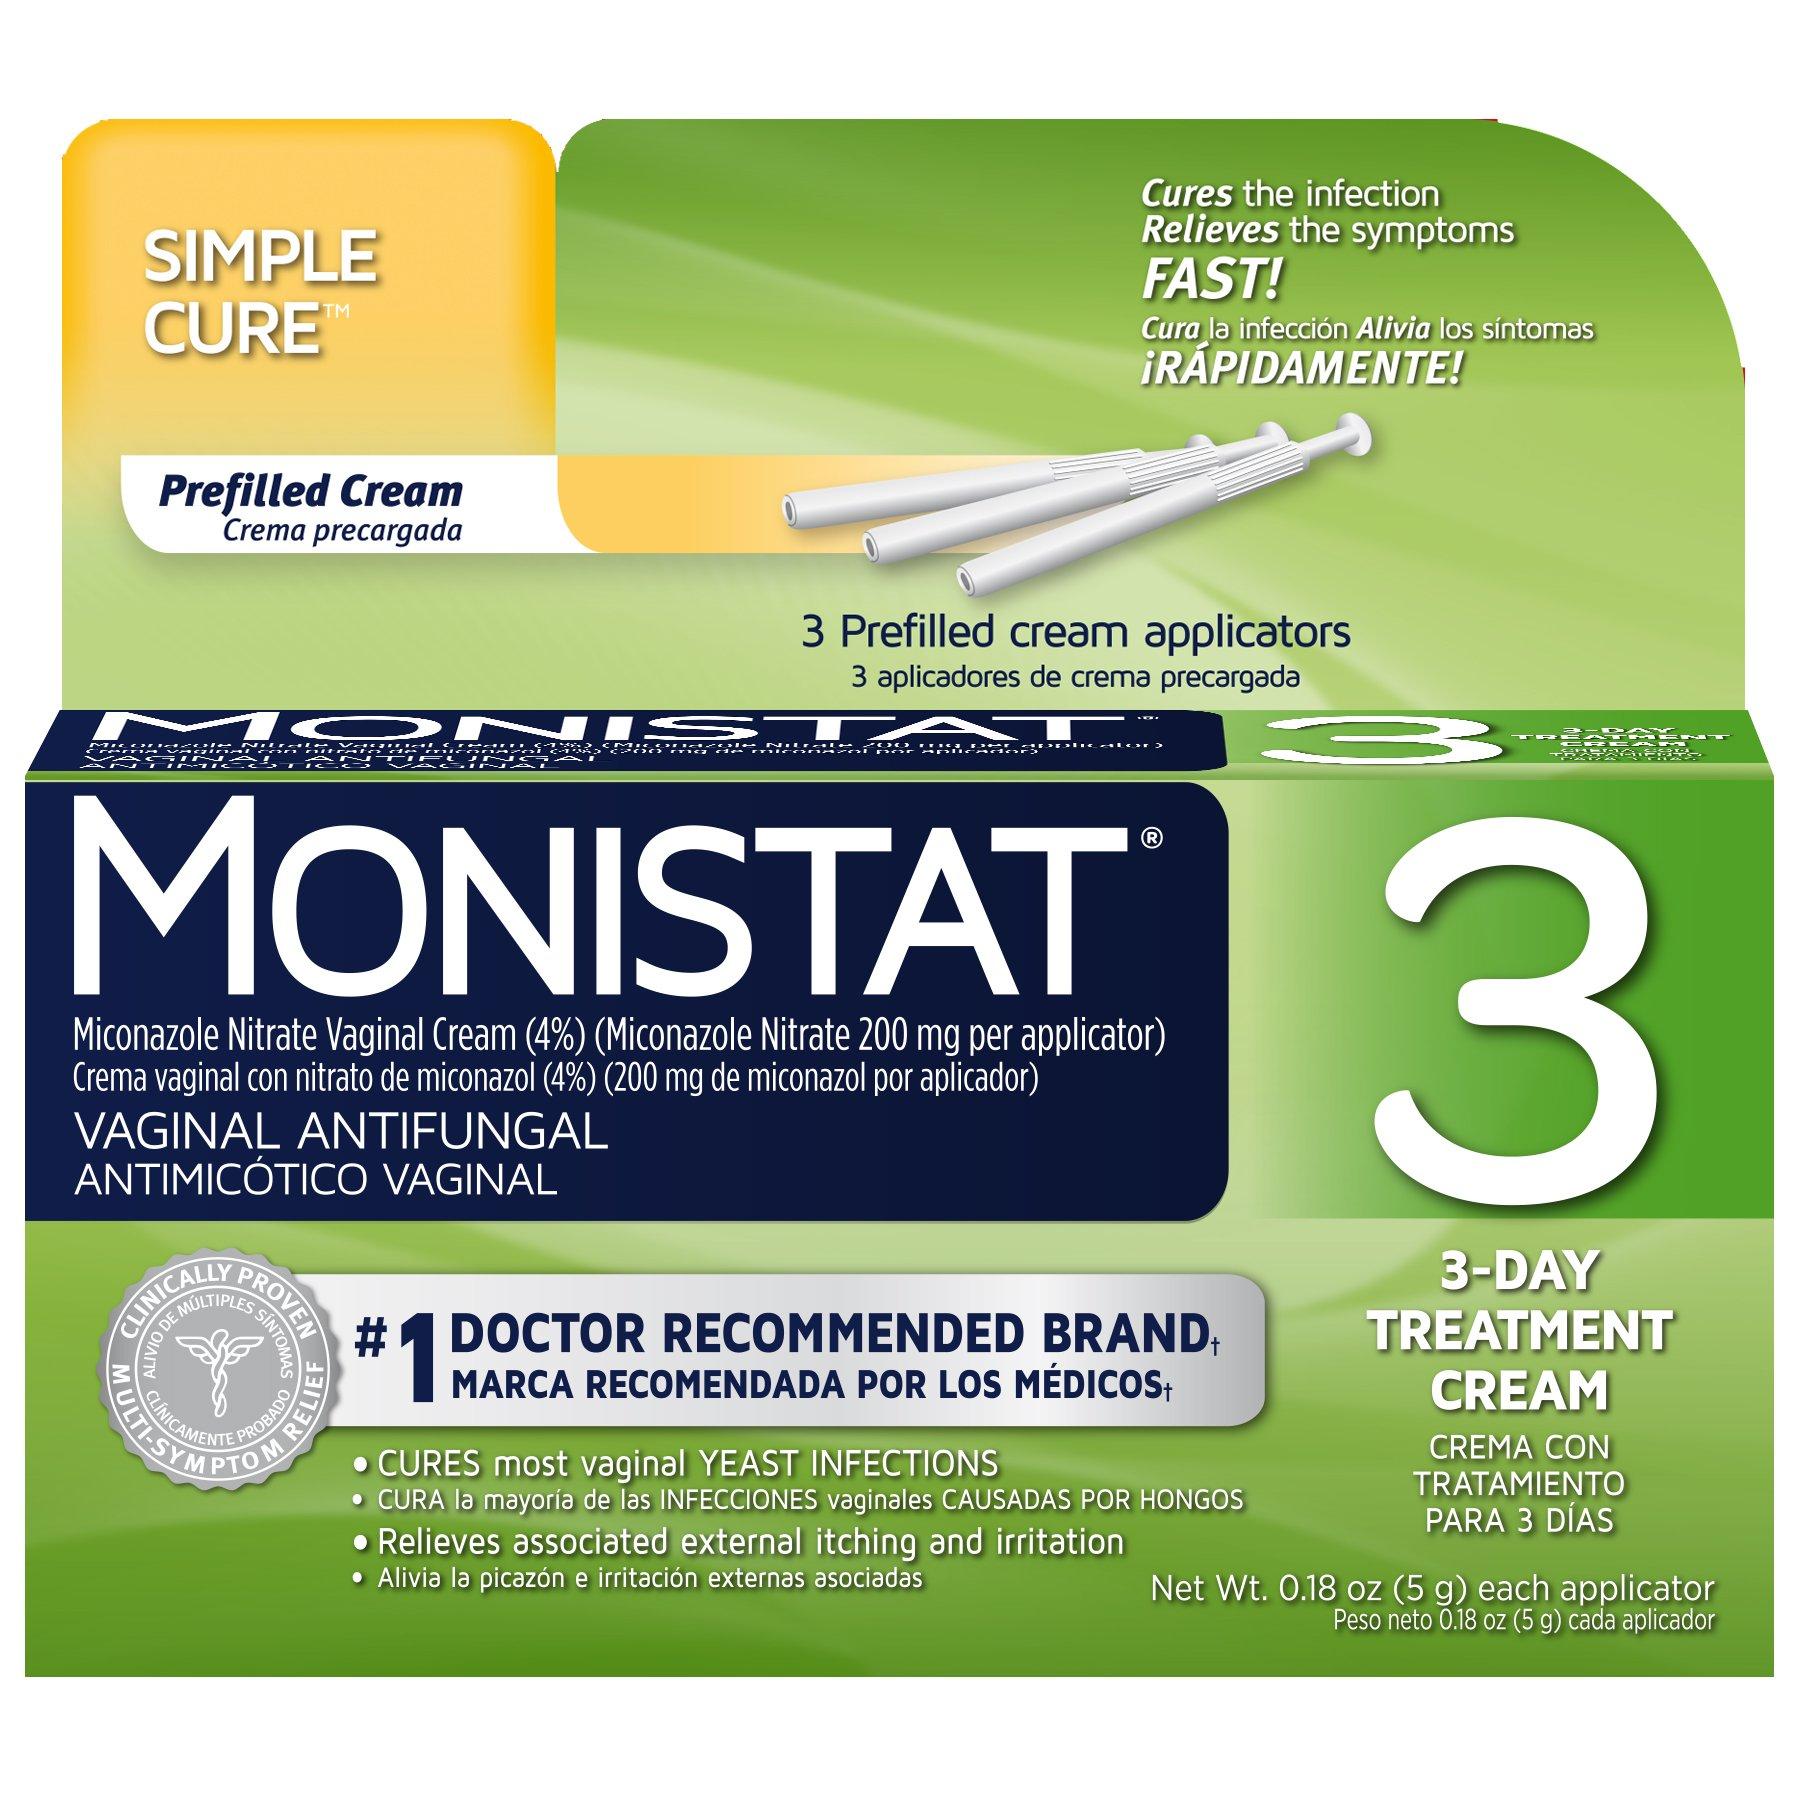 Monistat 3 Vaginal Antifungal Medication, 0.18 Ounce